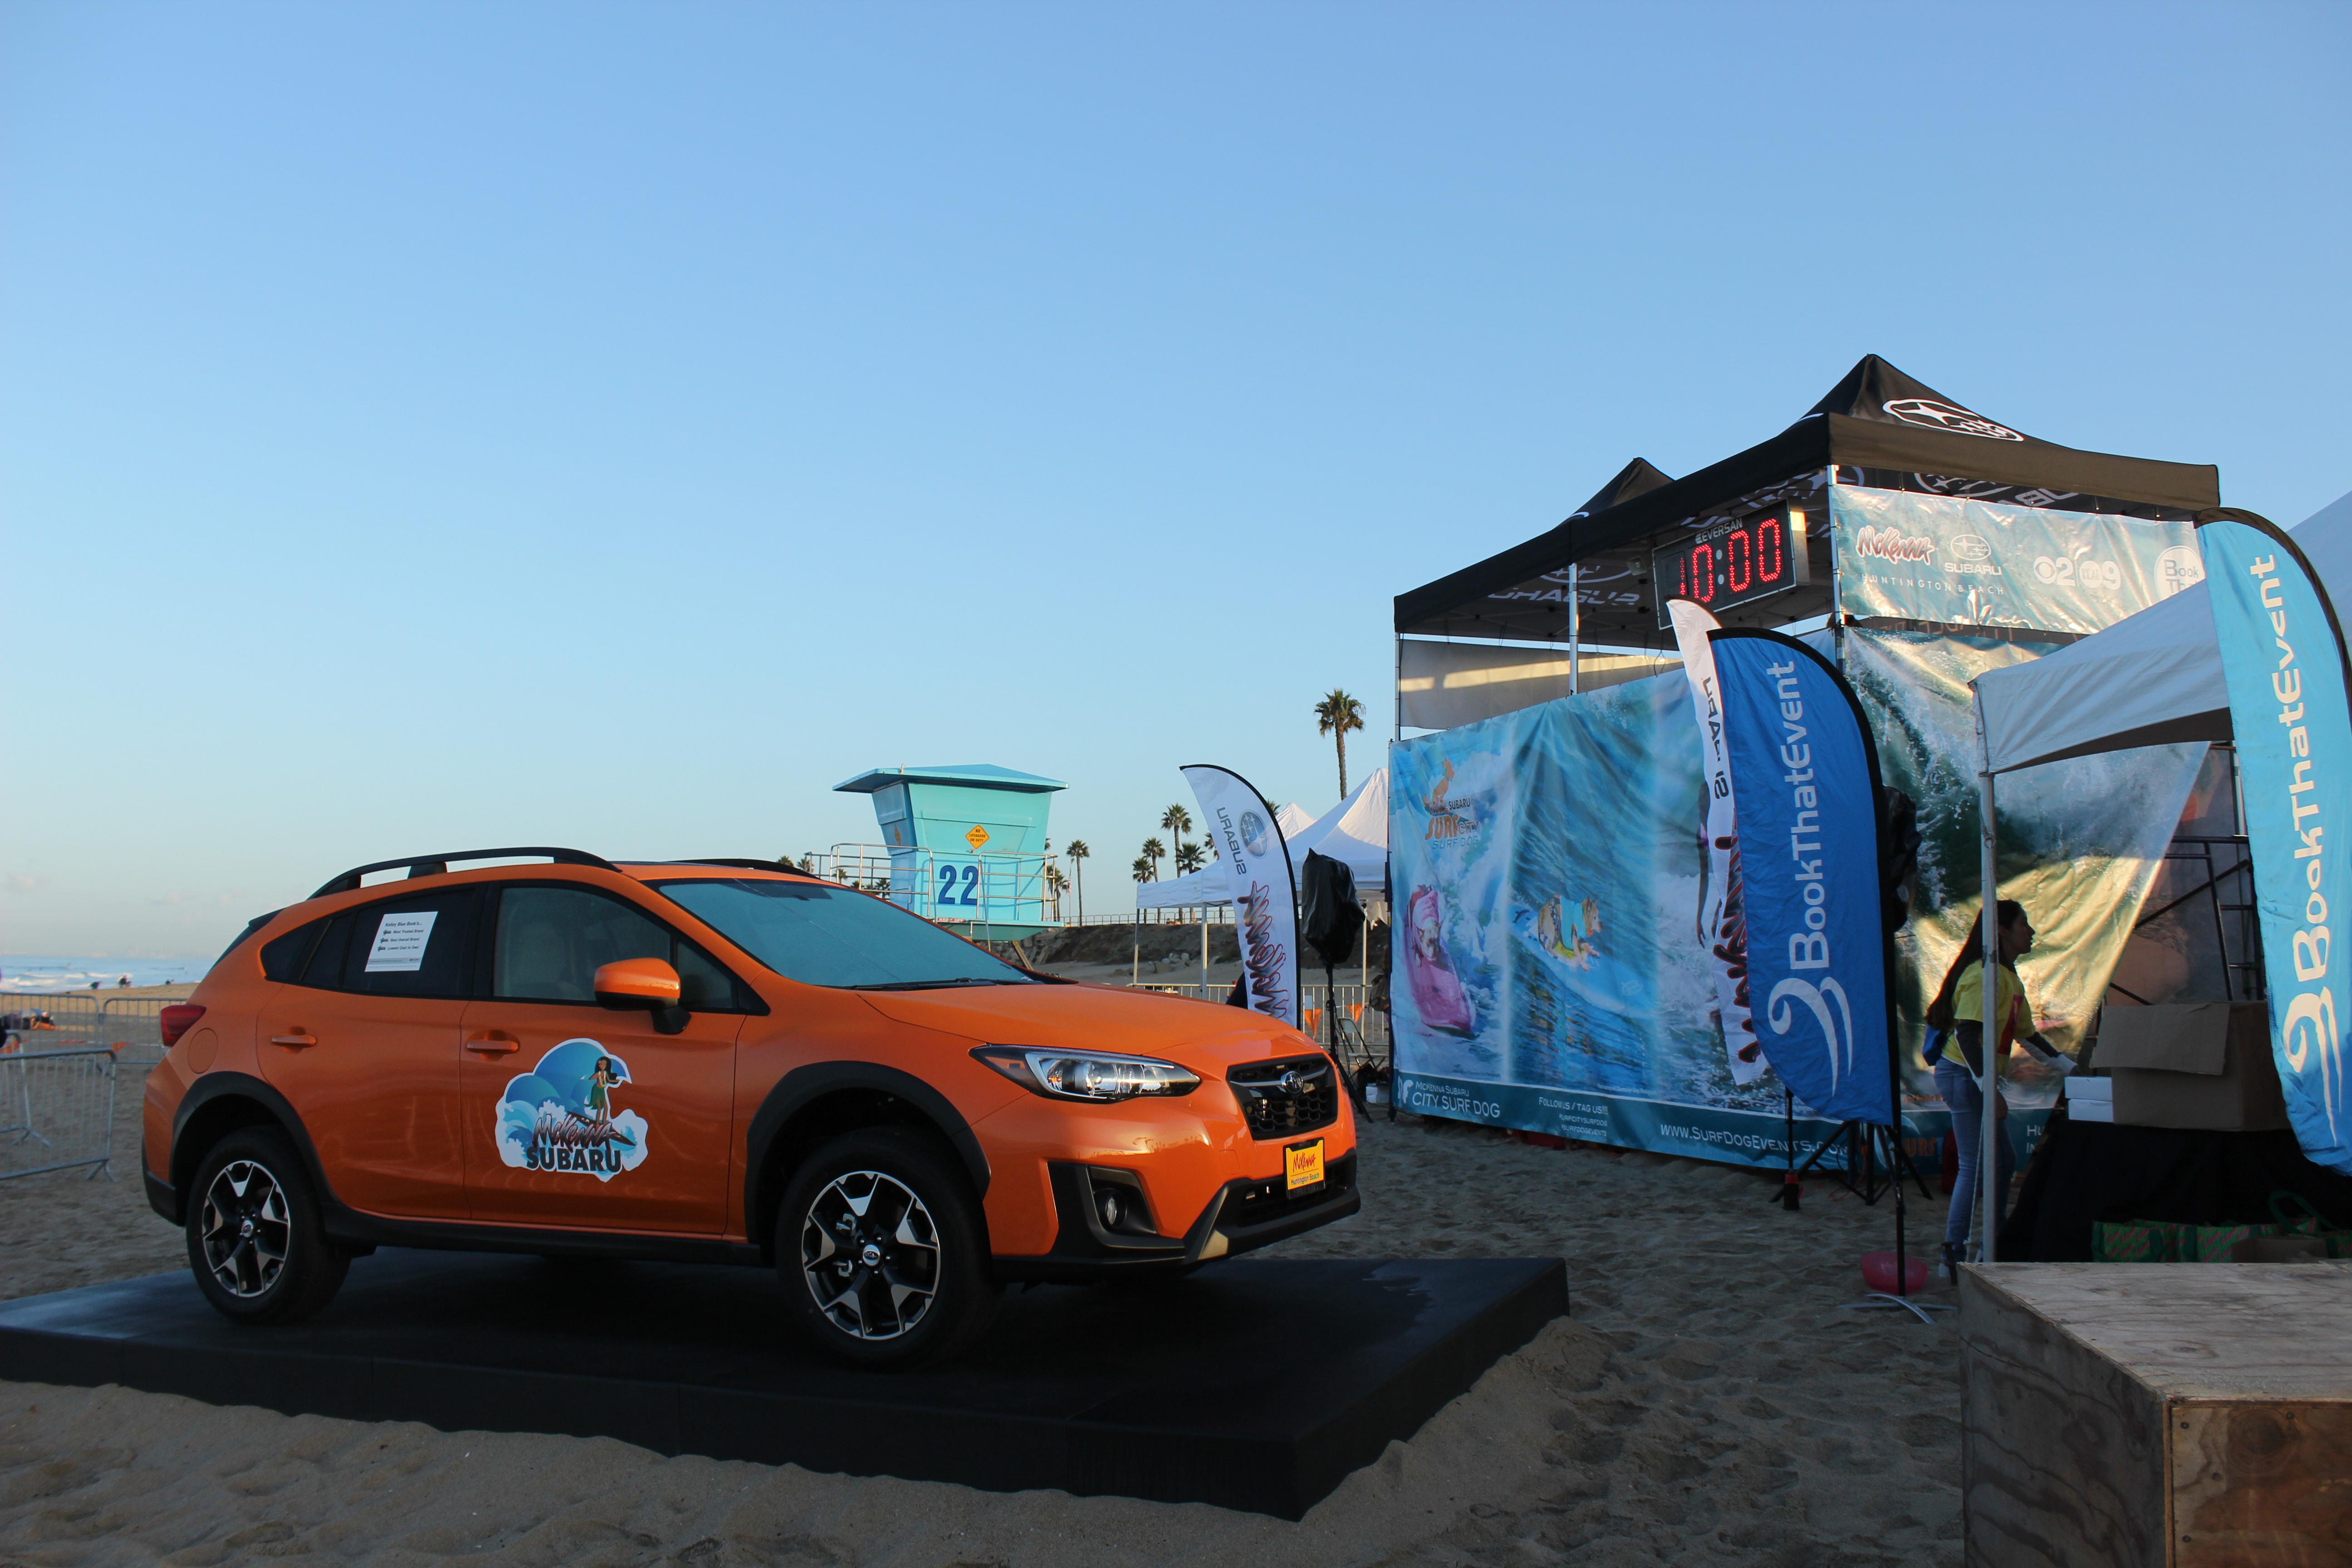 McKenna Subaru Surf City sponsored this event.